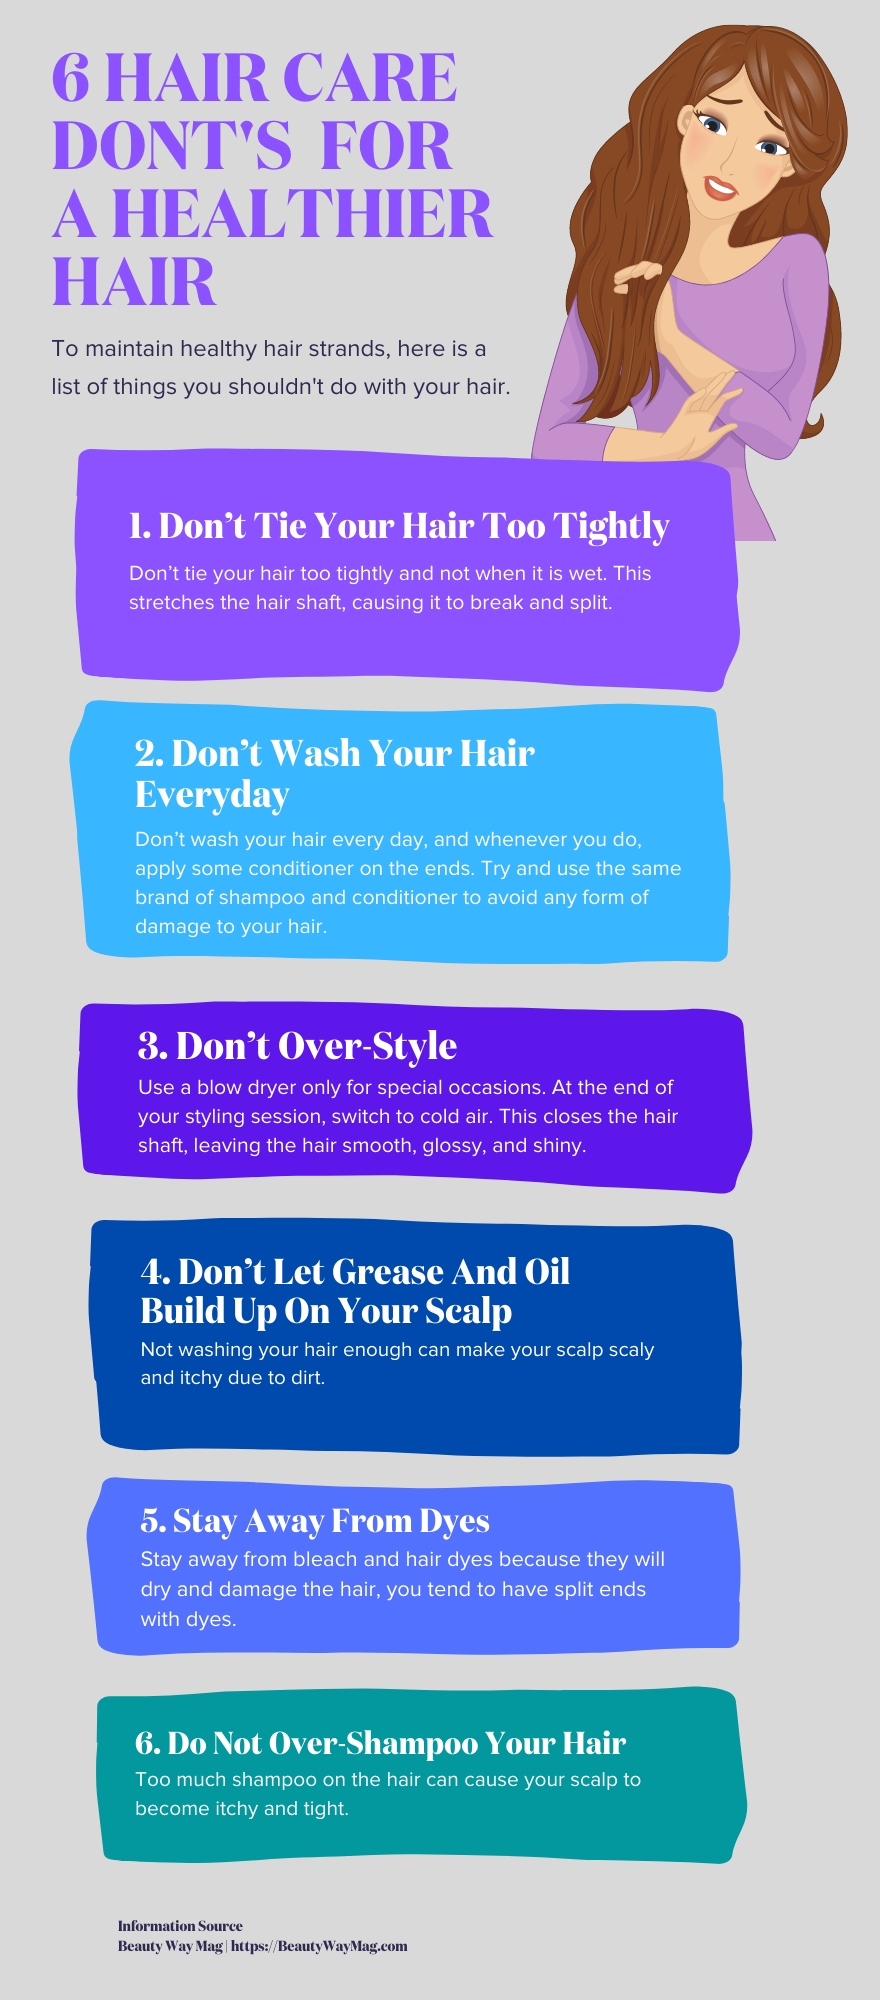 Hair care don't for healthier hair